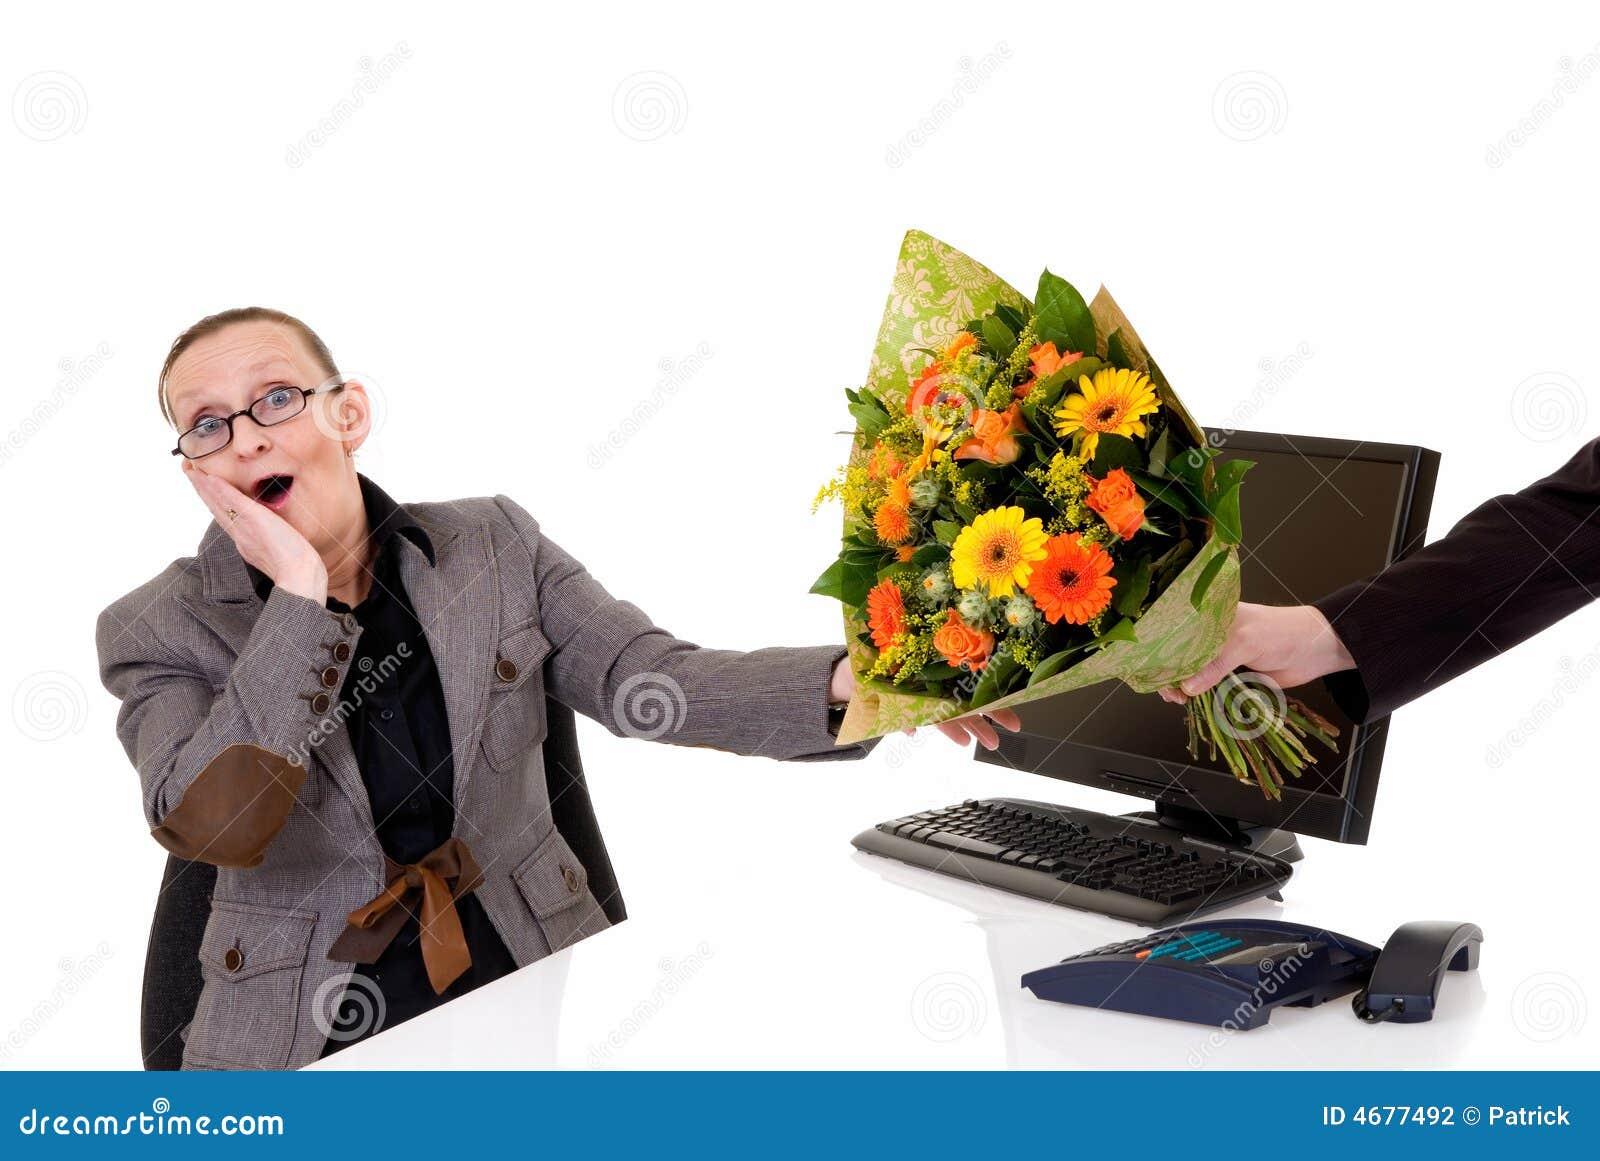 secretary day flowers